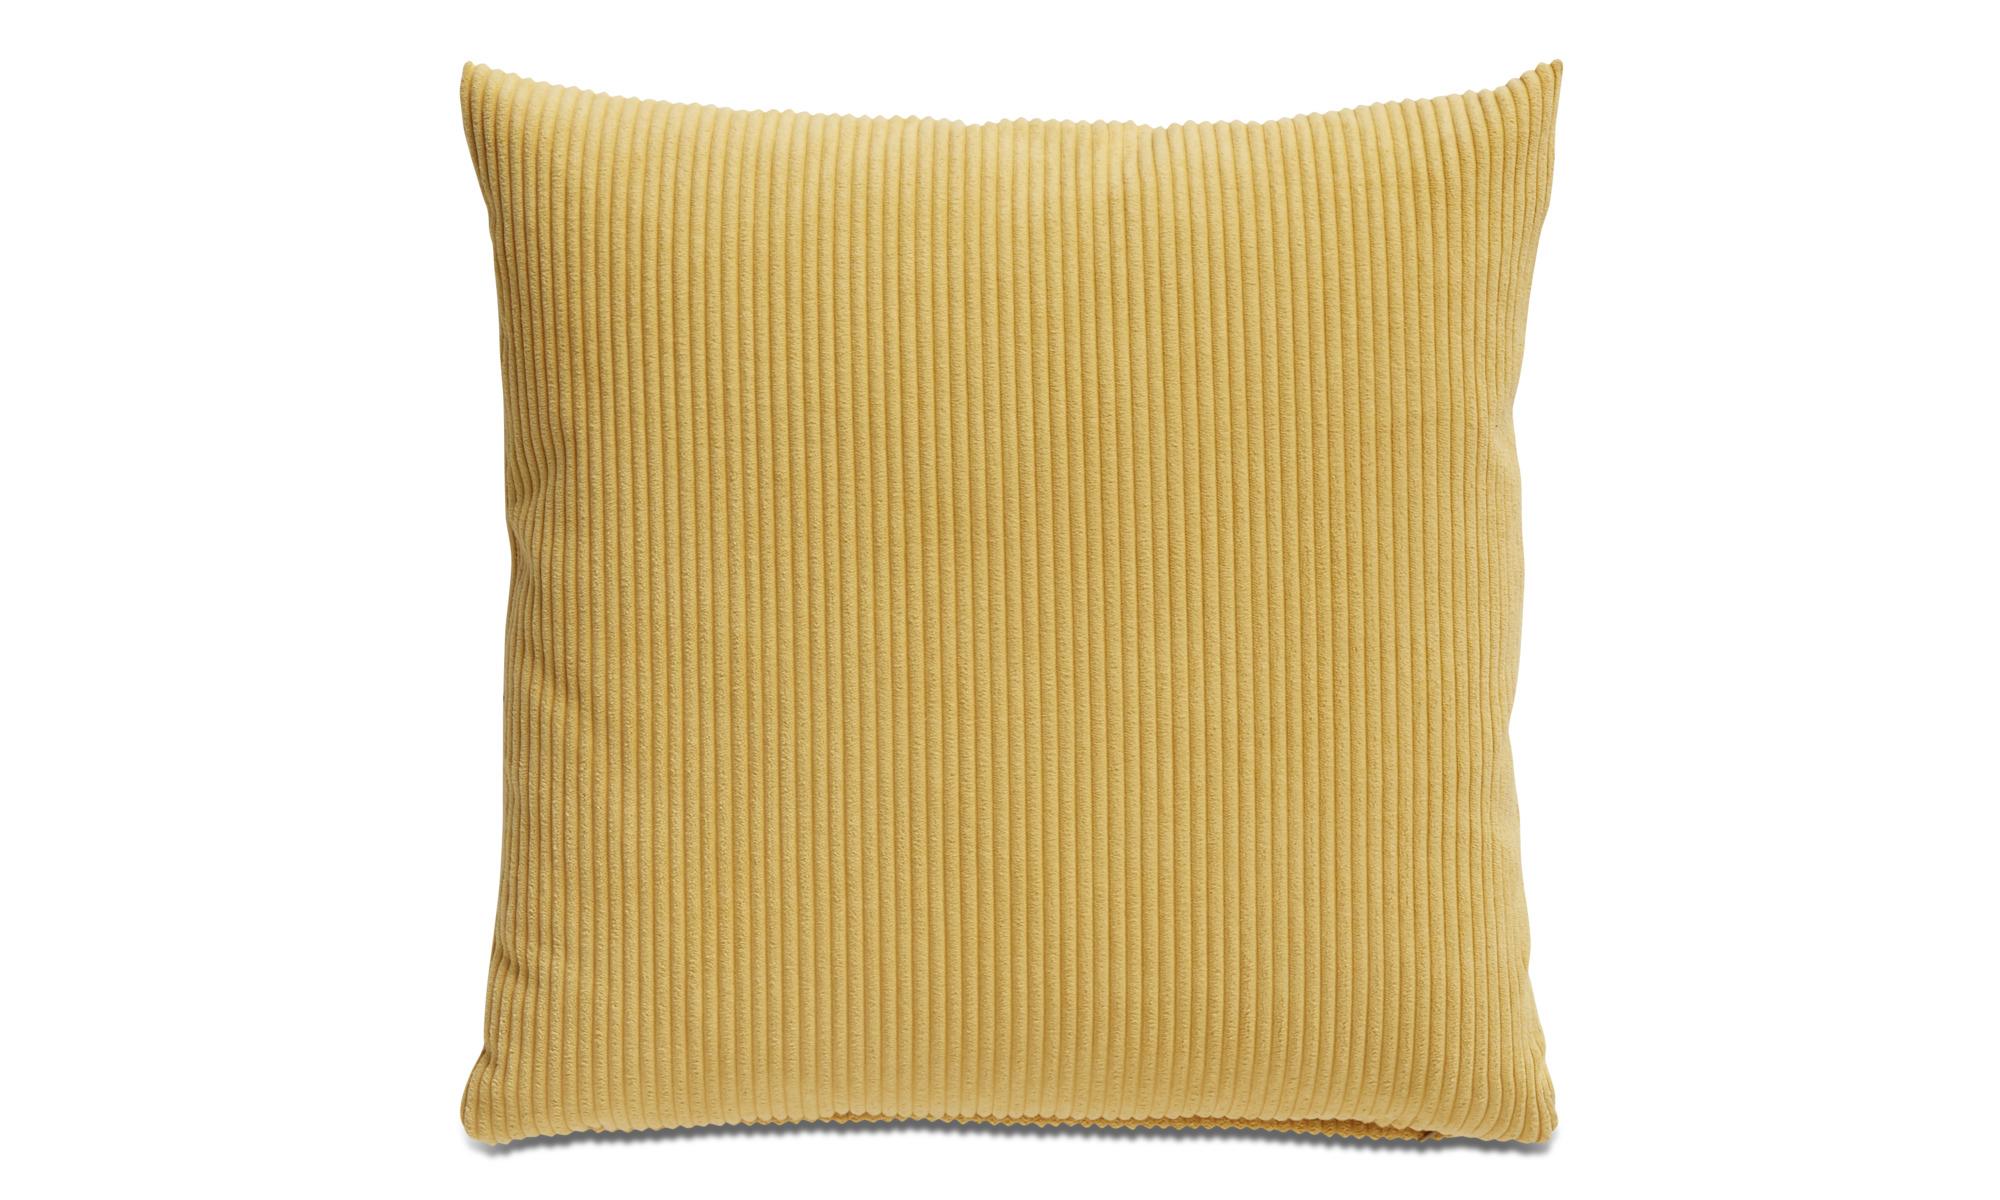 Cushions - Cord cushion - Yellow - Fabric